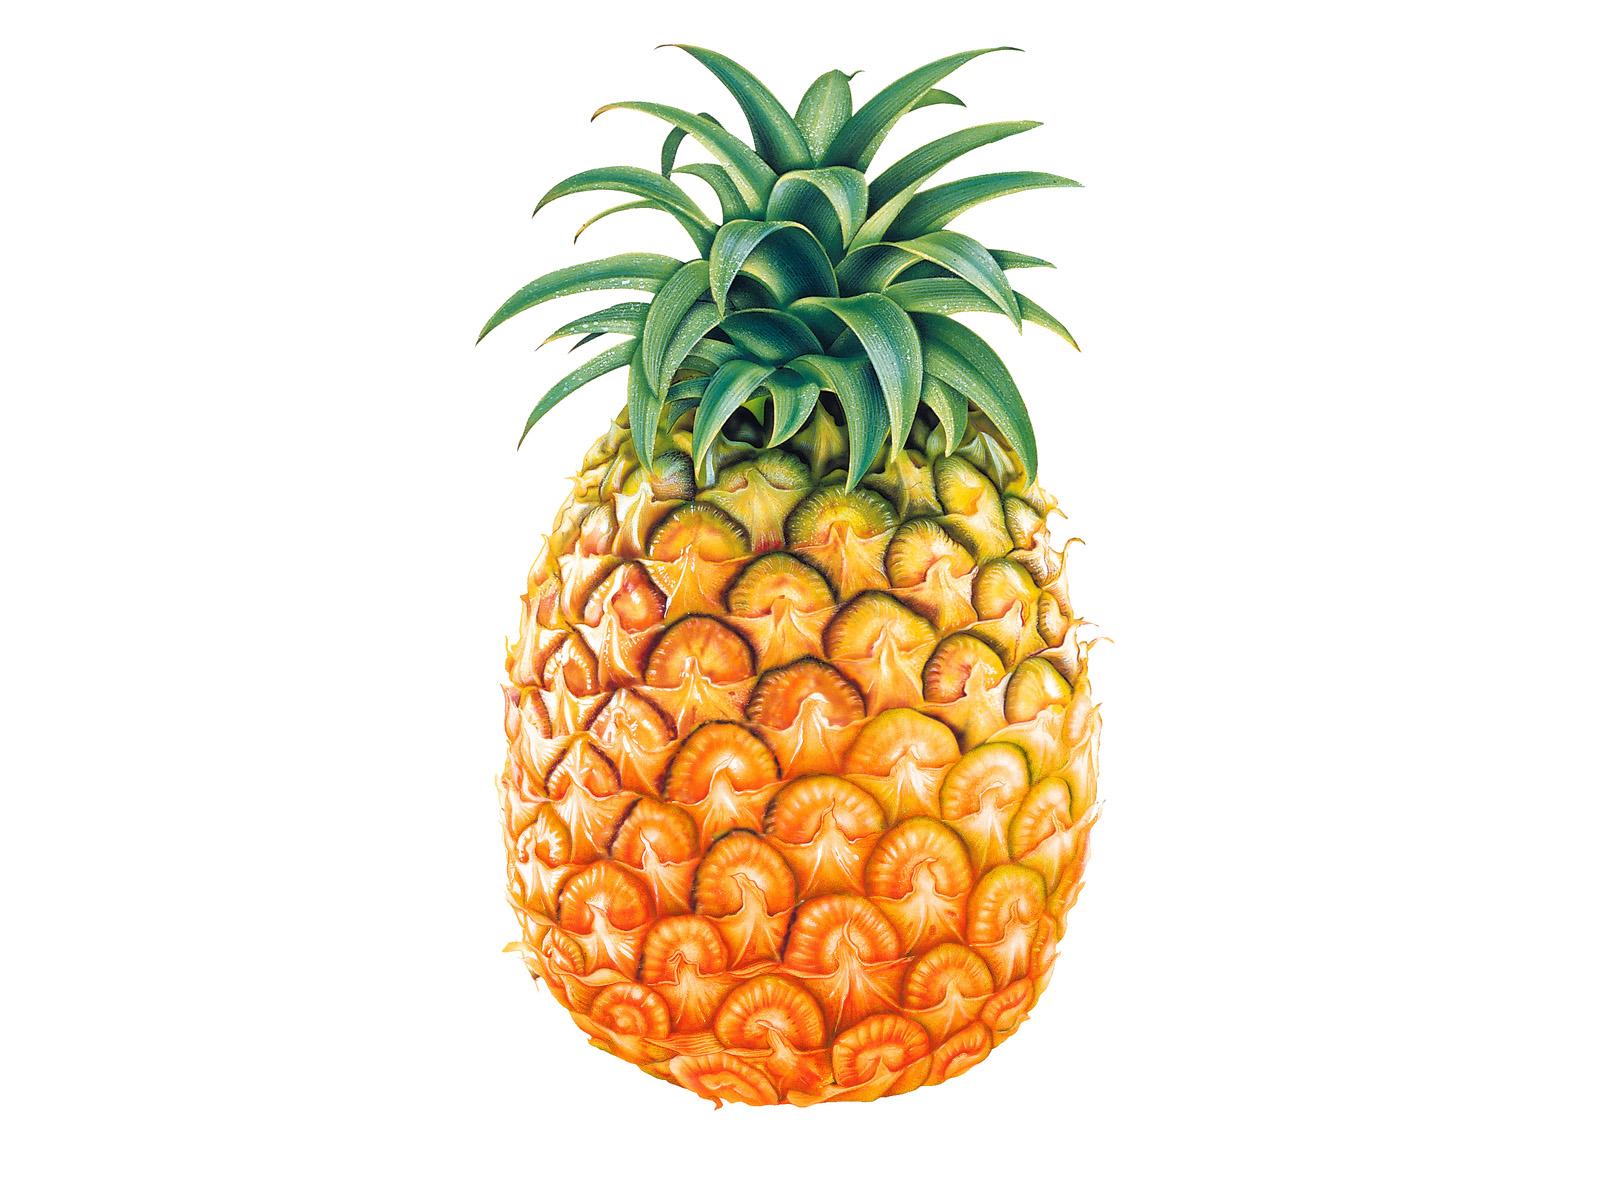 1600x1200 Pineapple Vector